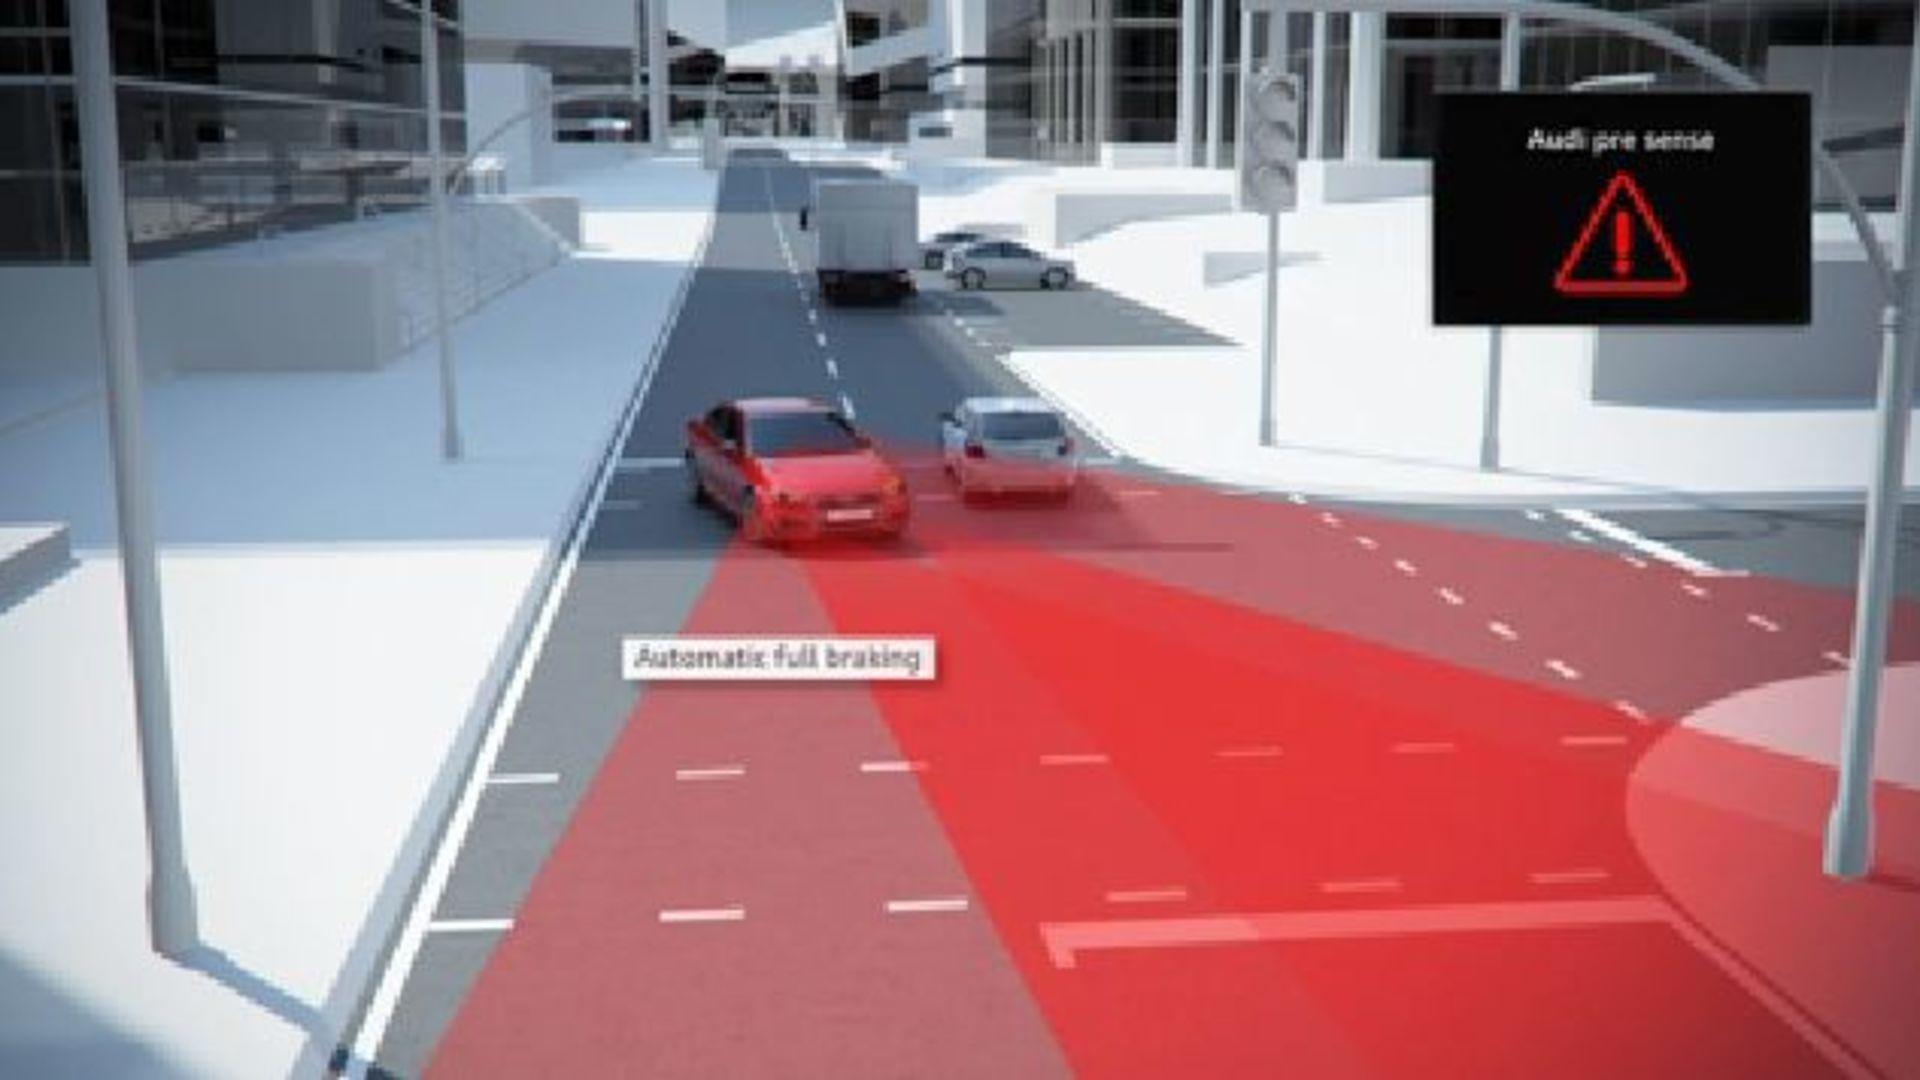 Audi A4 (2015) - Animation turn assist